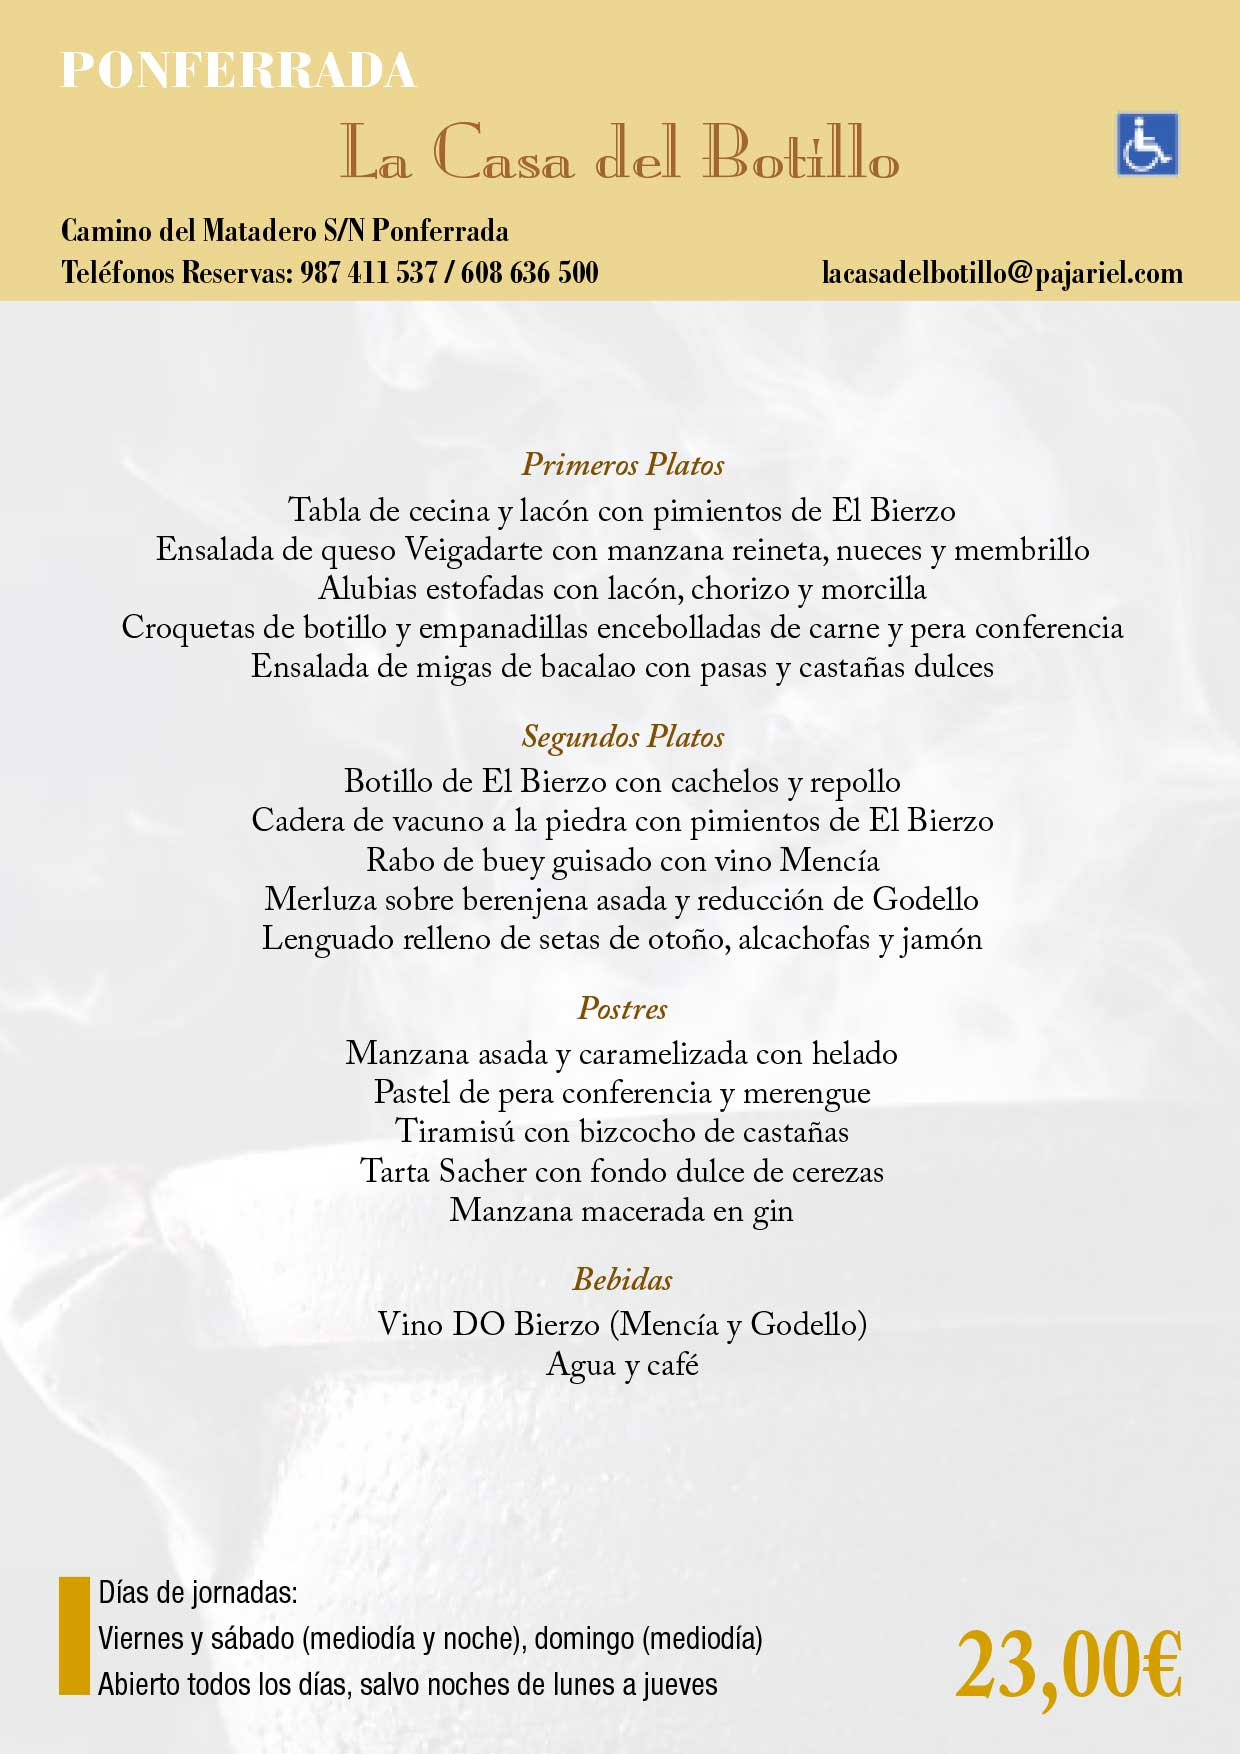 XXXIII Jornadas gastronómicas del Bierzo 2017. Restaurantes participantes 28